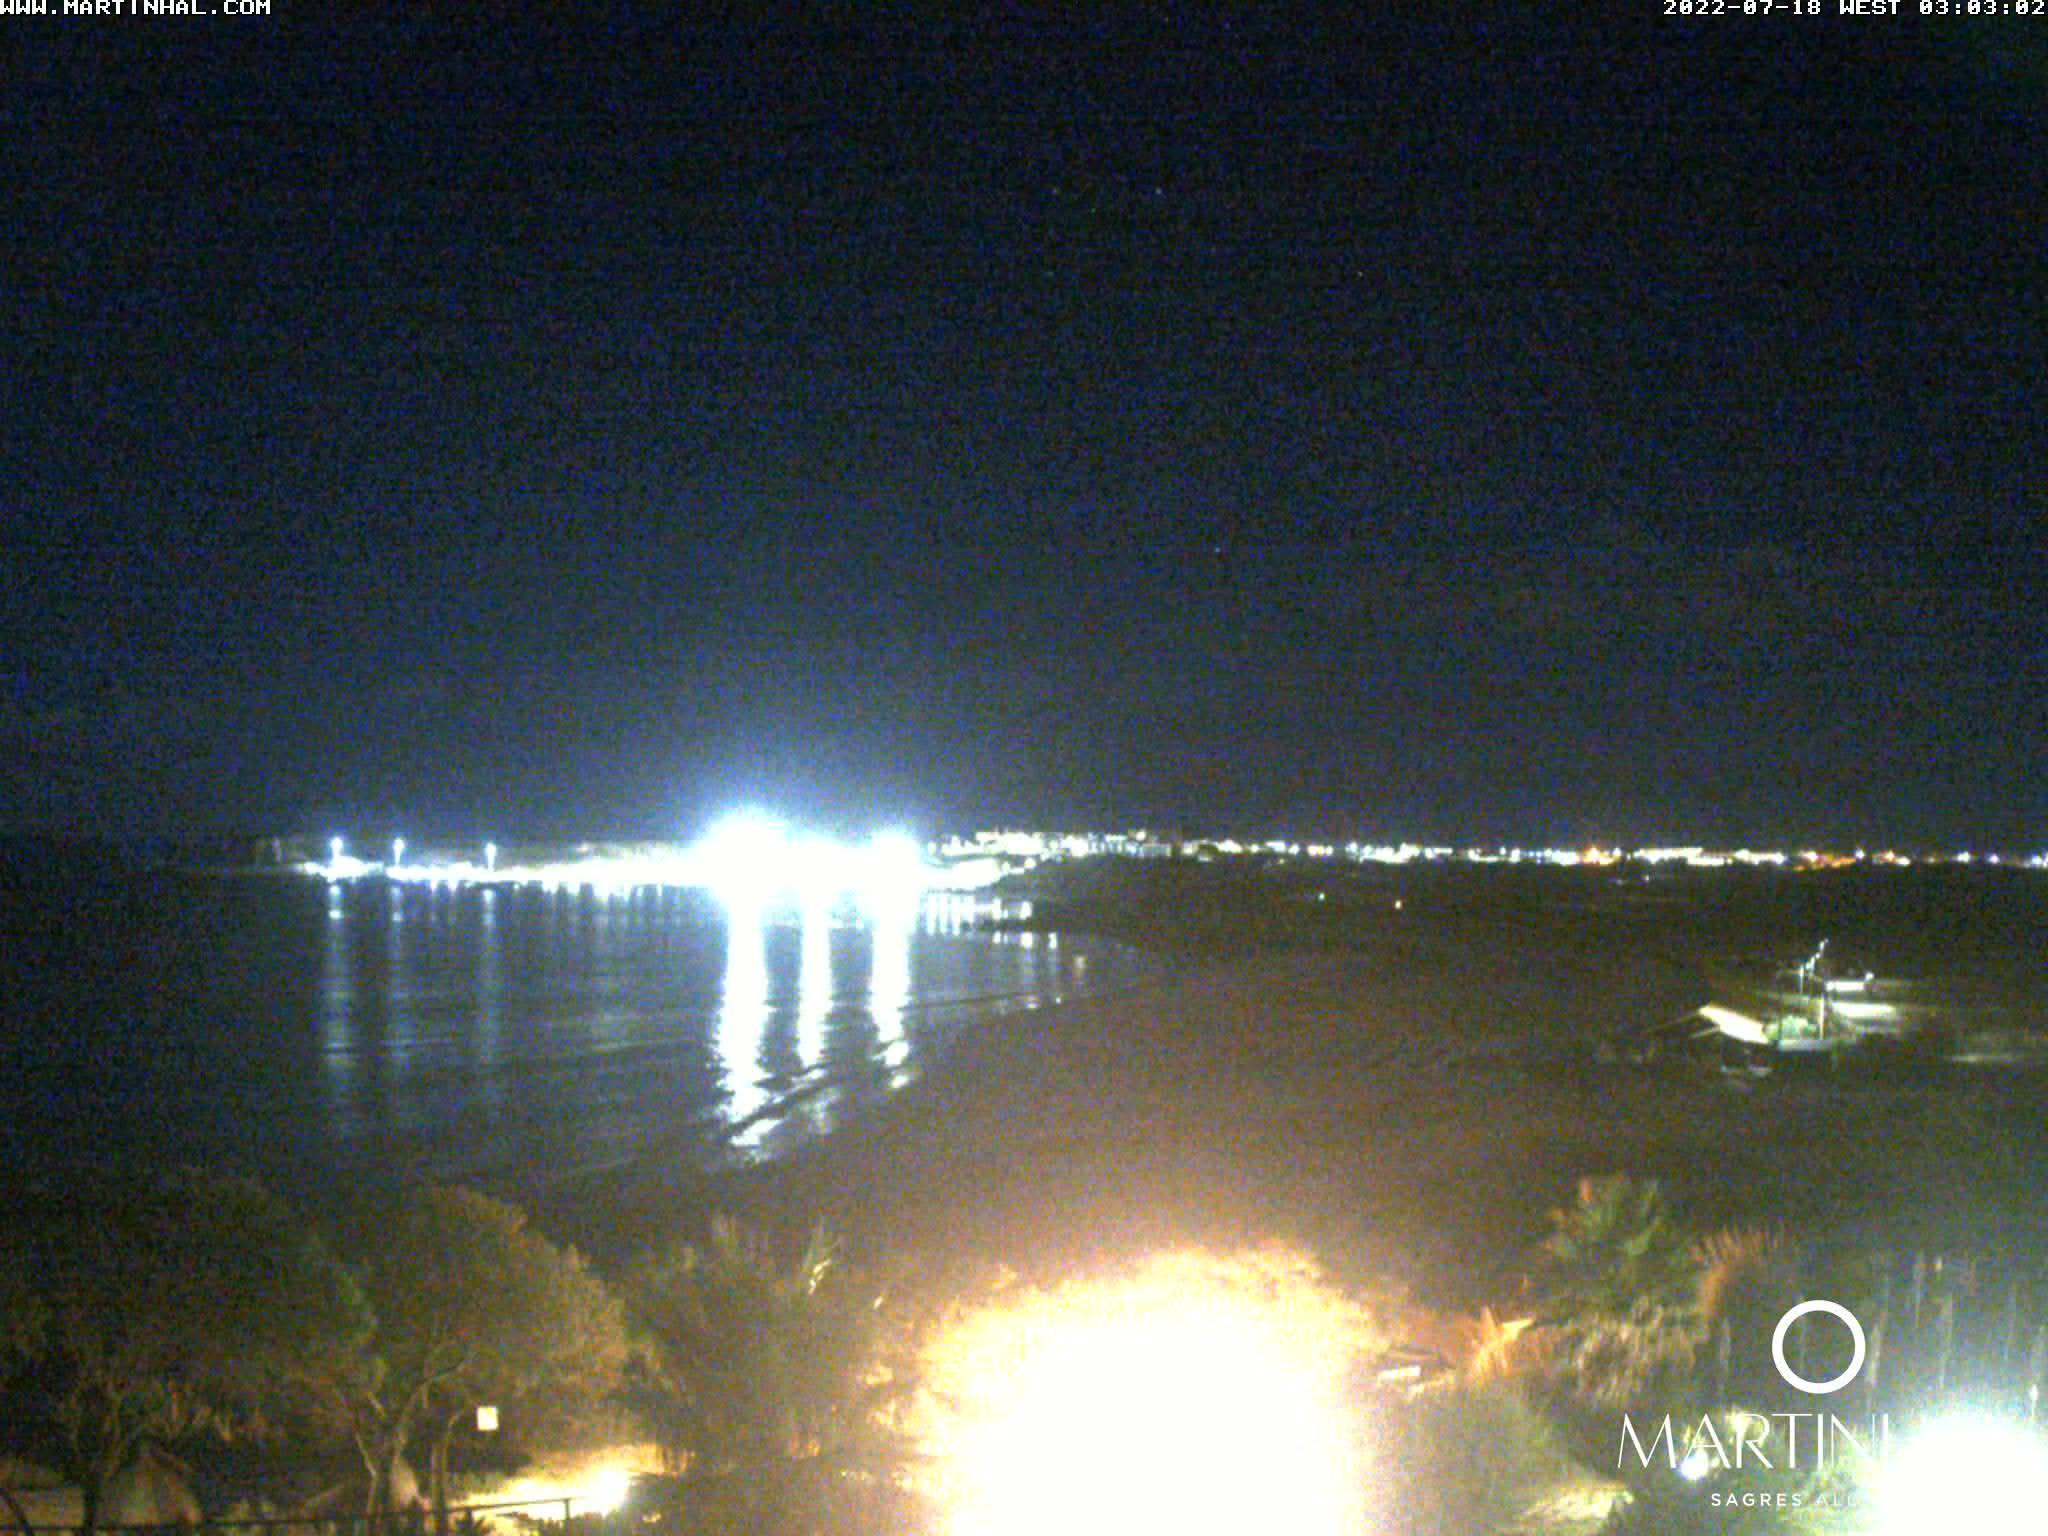 Webcam Sagres Algarve Portugal 3am